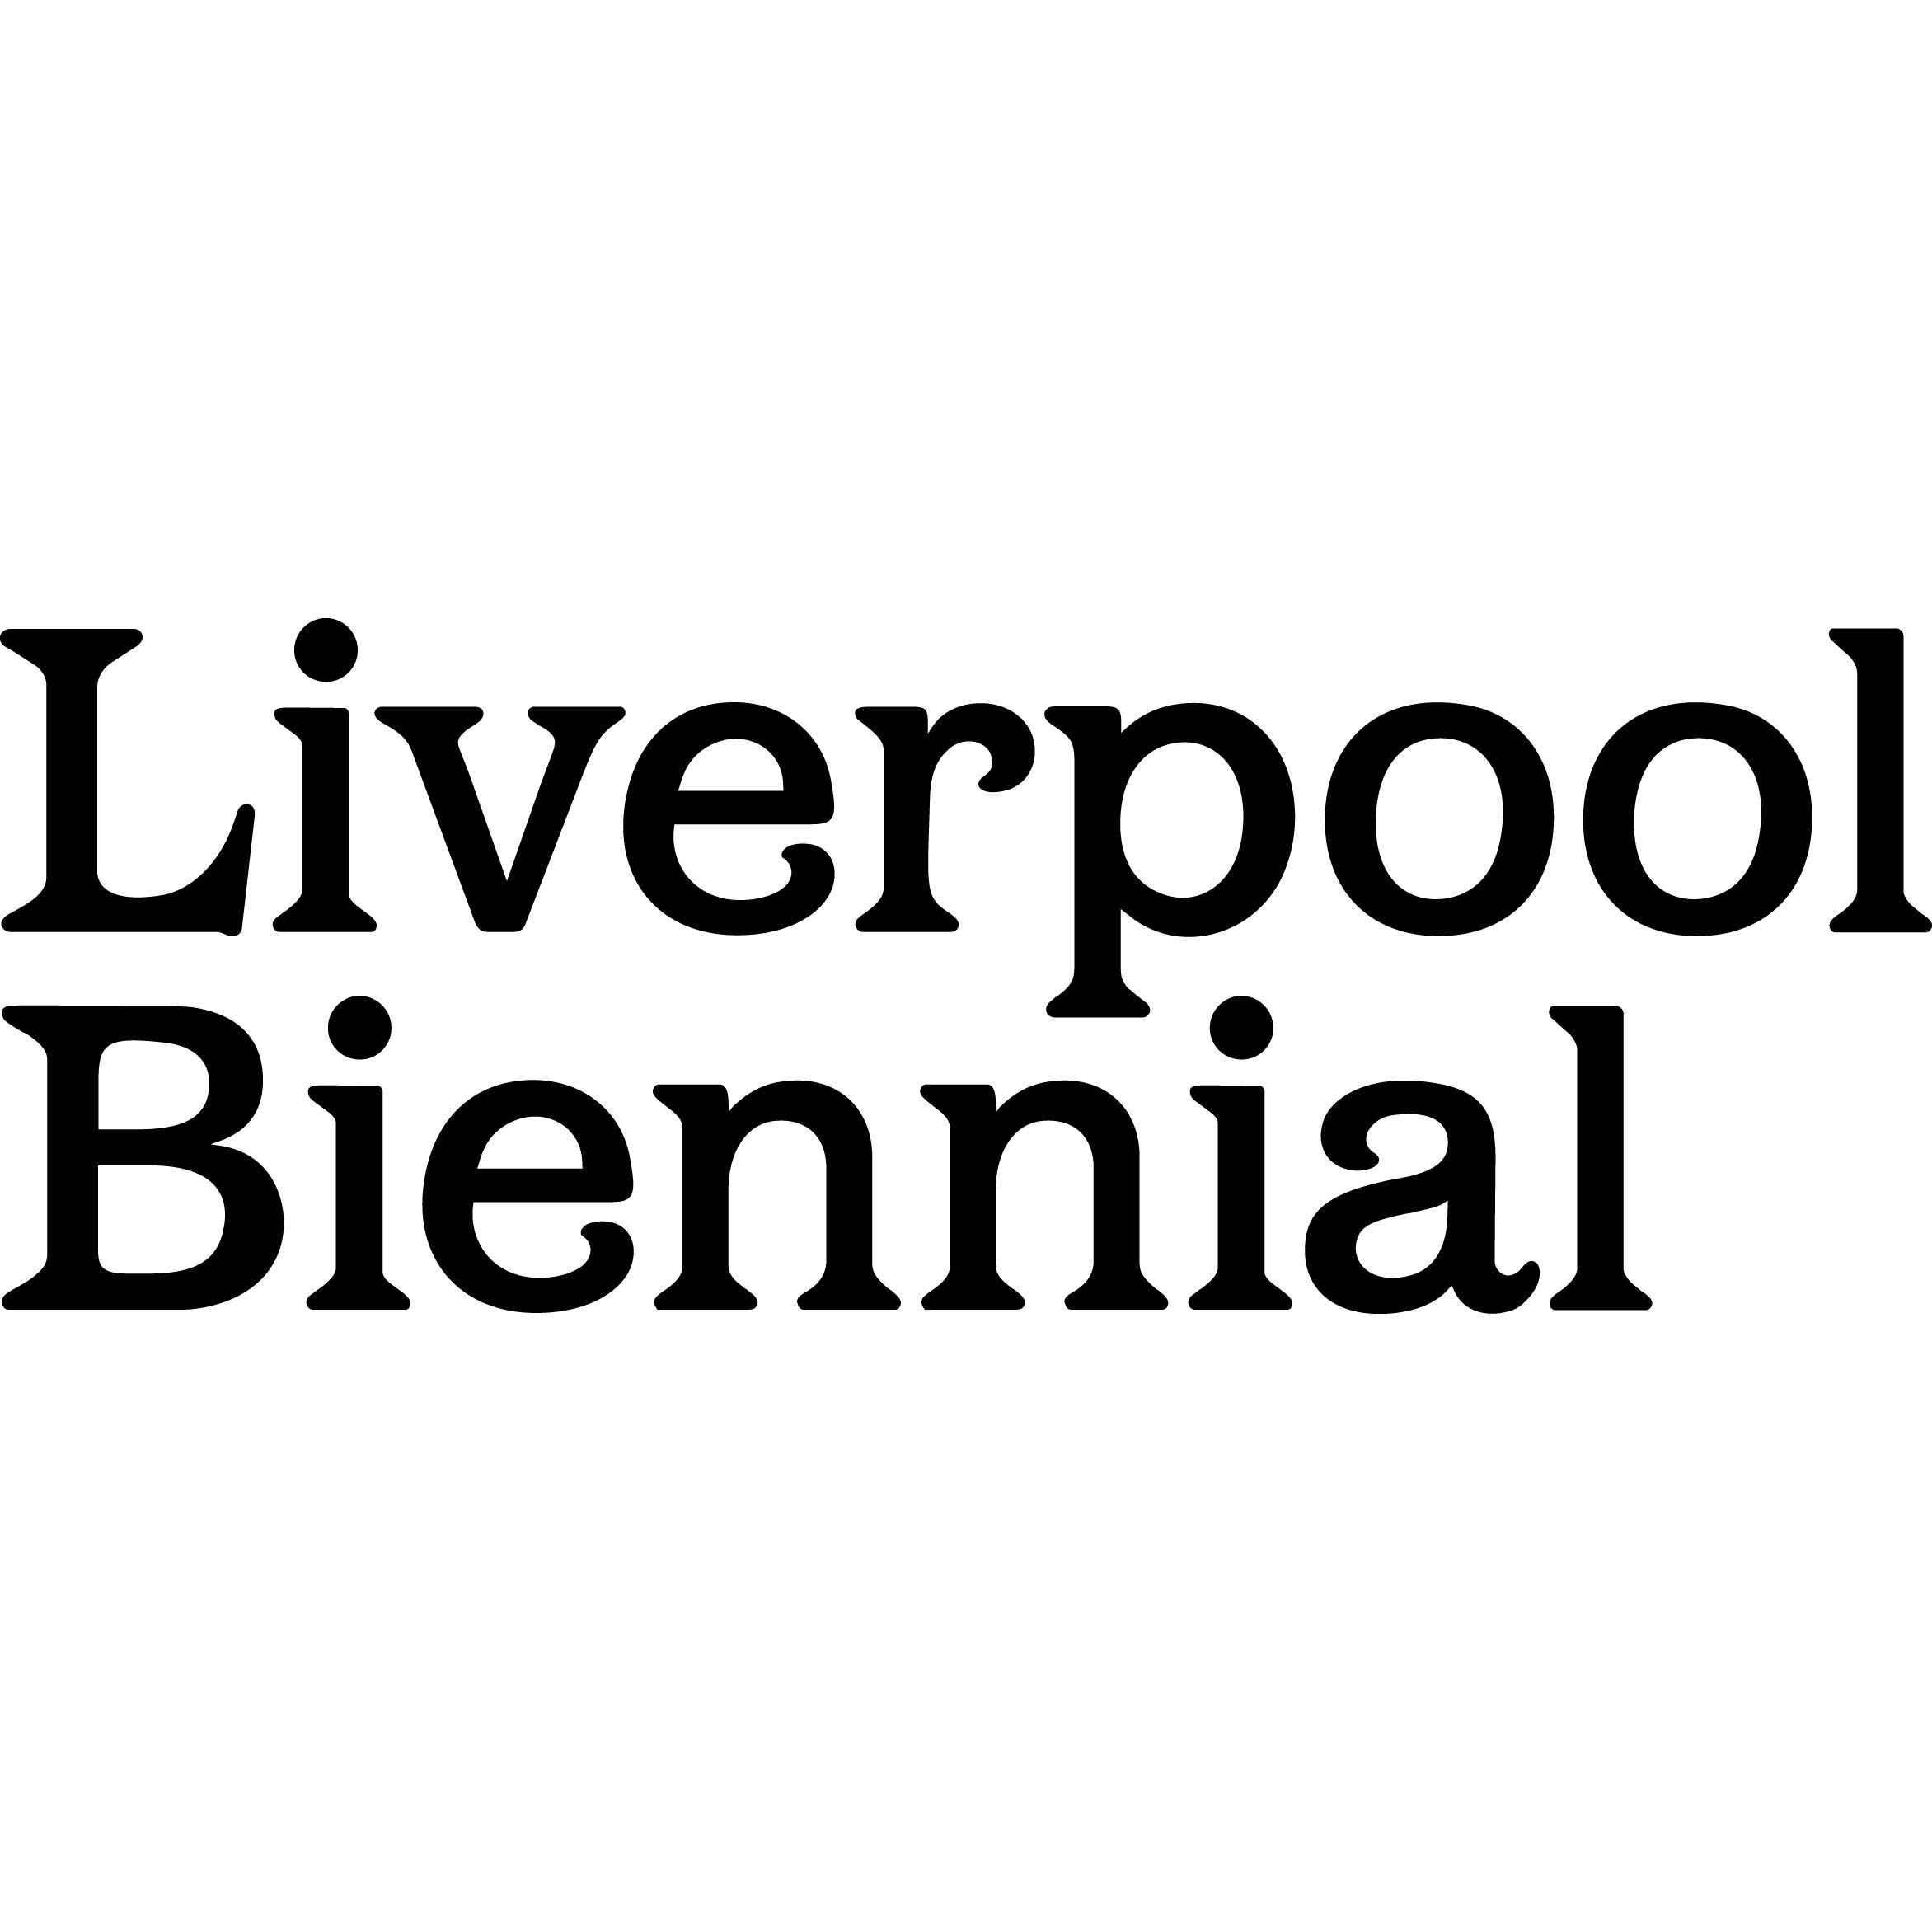 Liverpool Biennial Logo.jpg